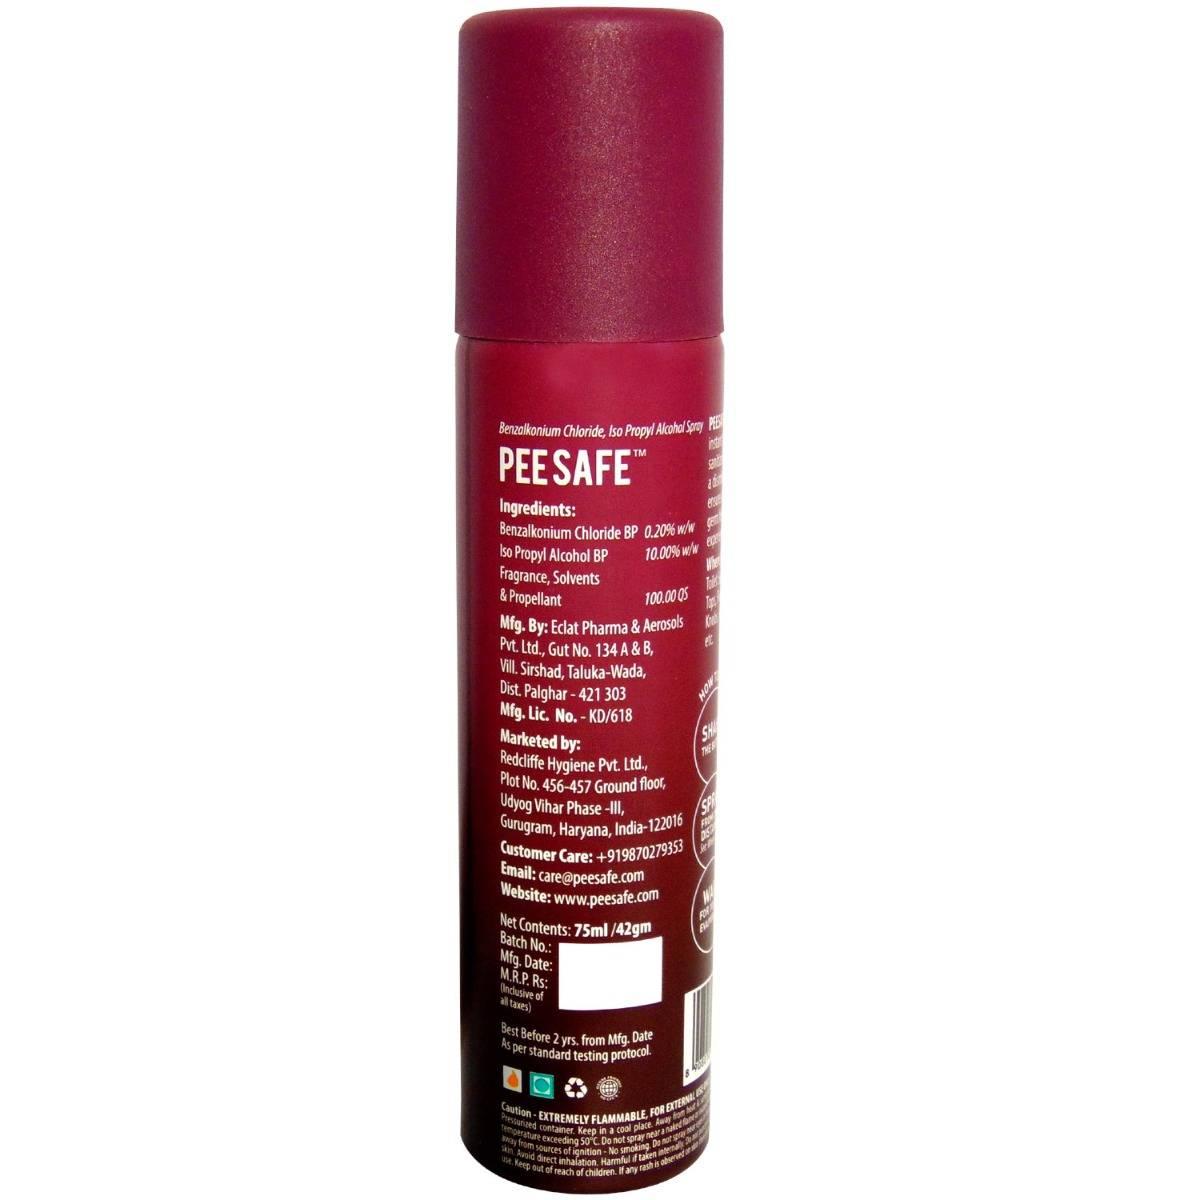 Pee Safe Lavender Toilet Seat Sanitizer Spray, 75 ml, Pack of 1